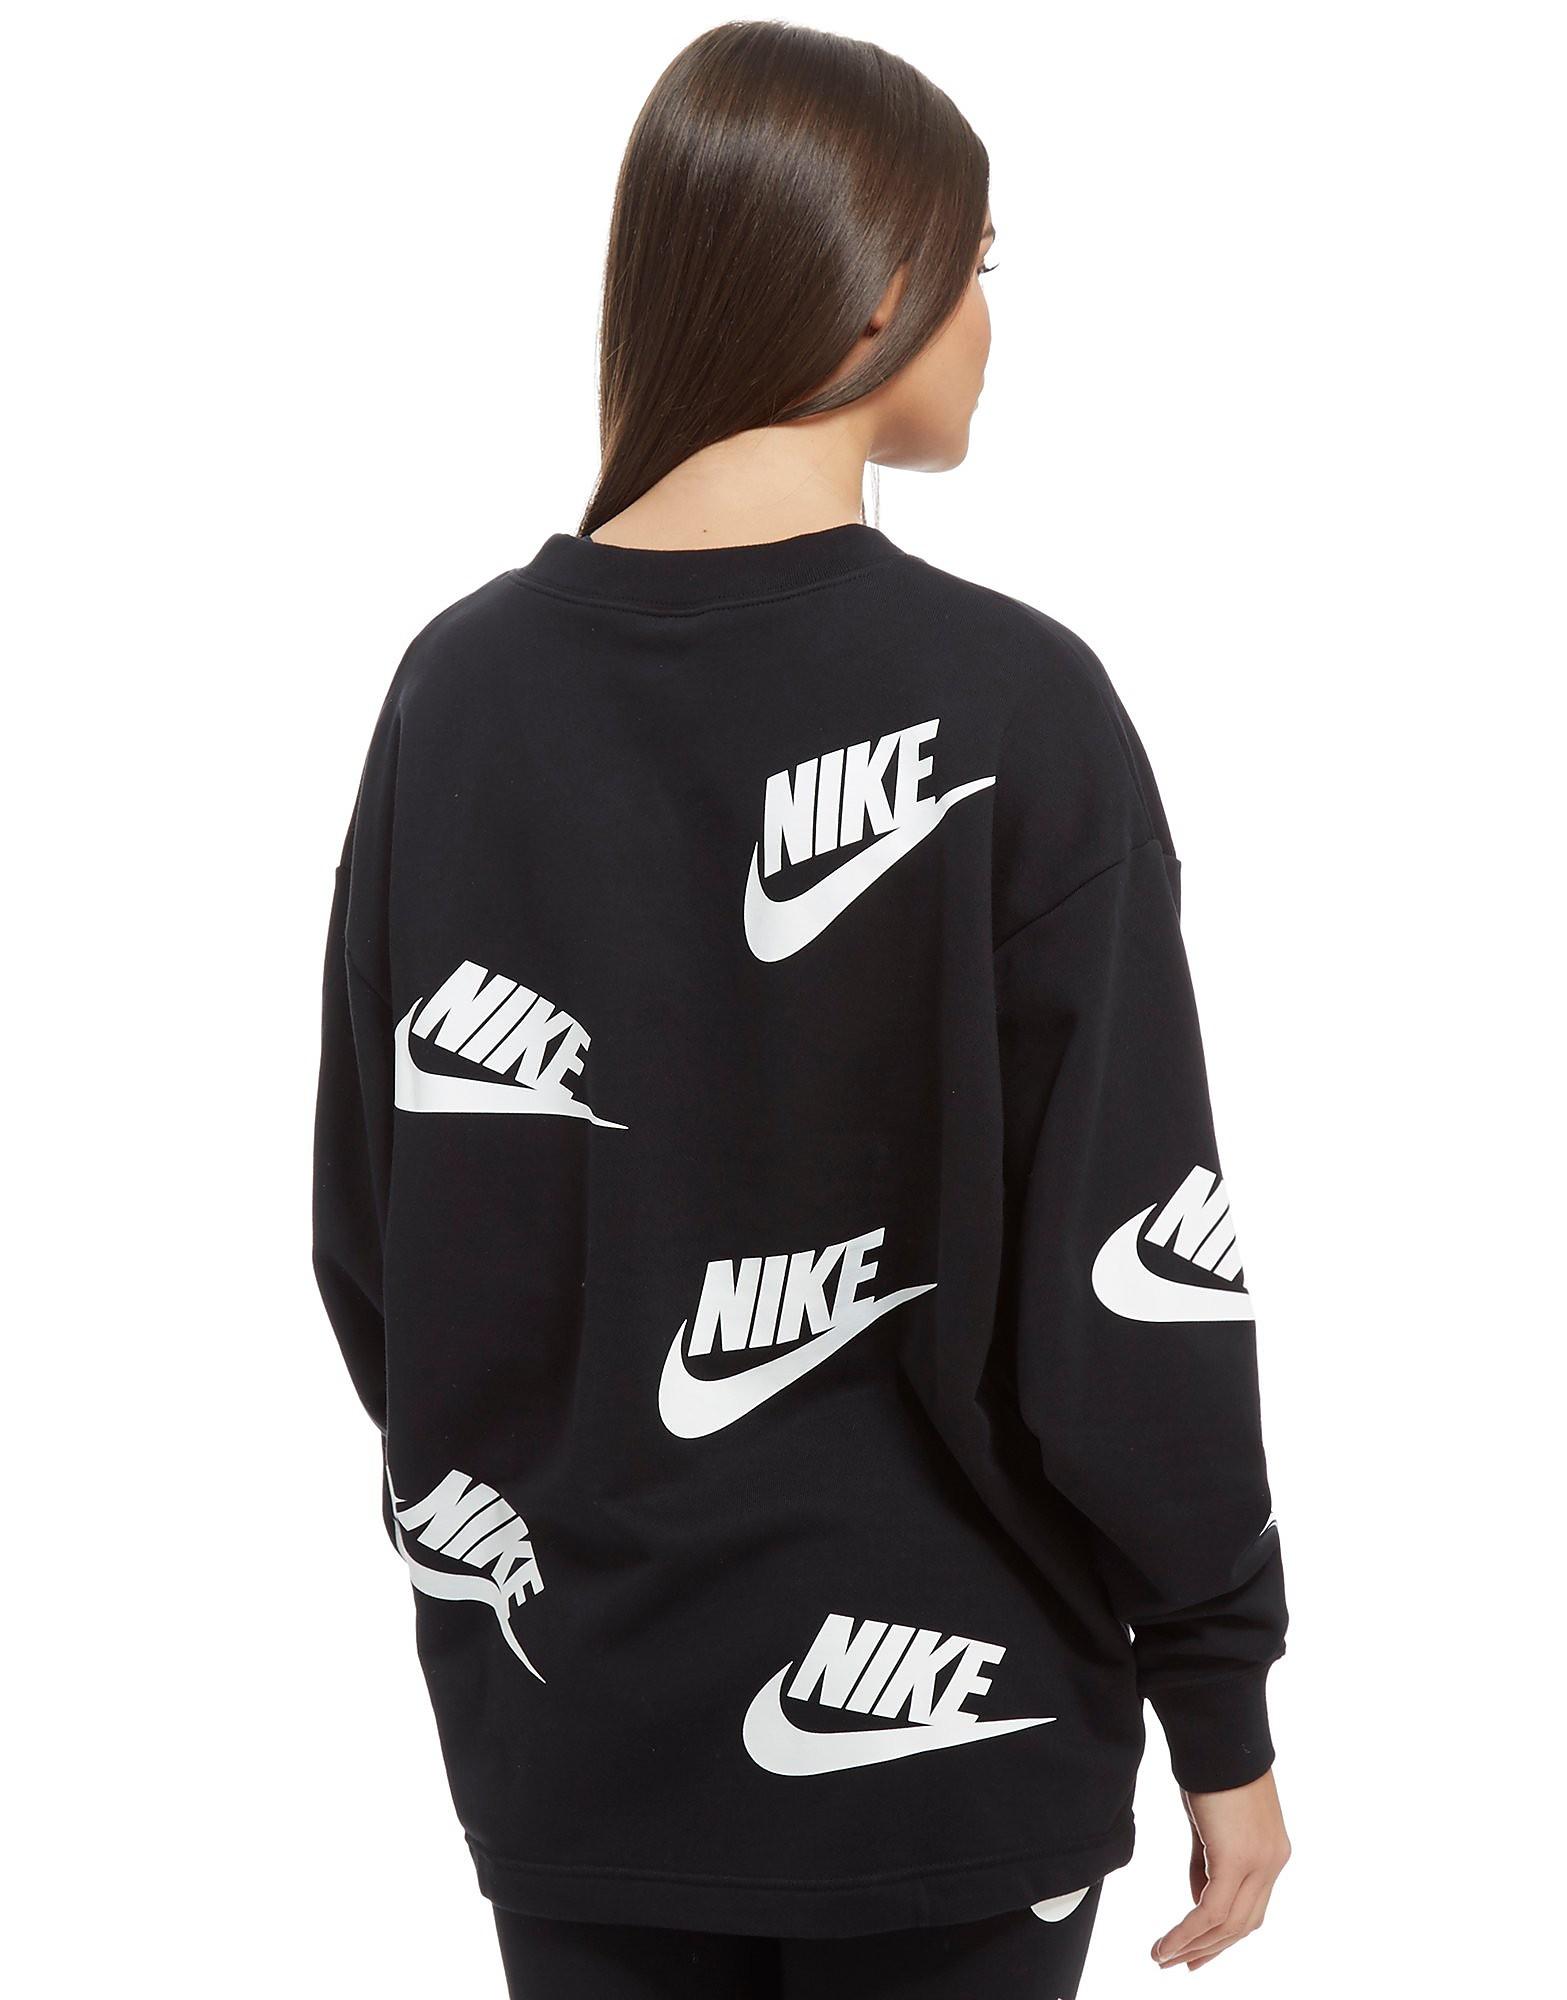 Nike All Over Print Futura Crew Sweatshirt